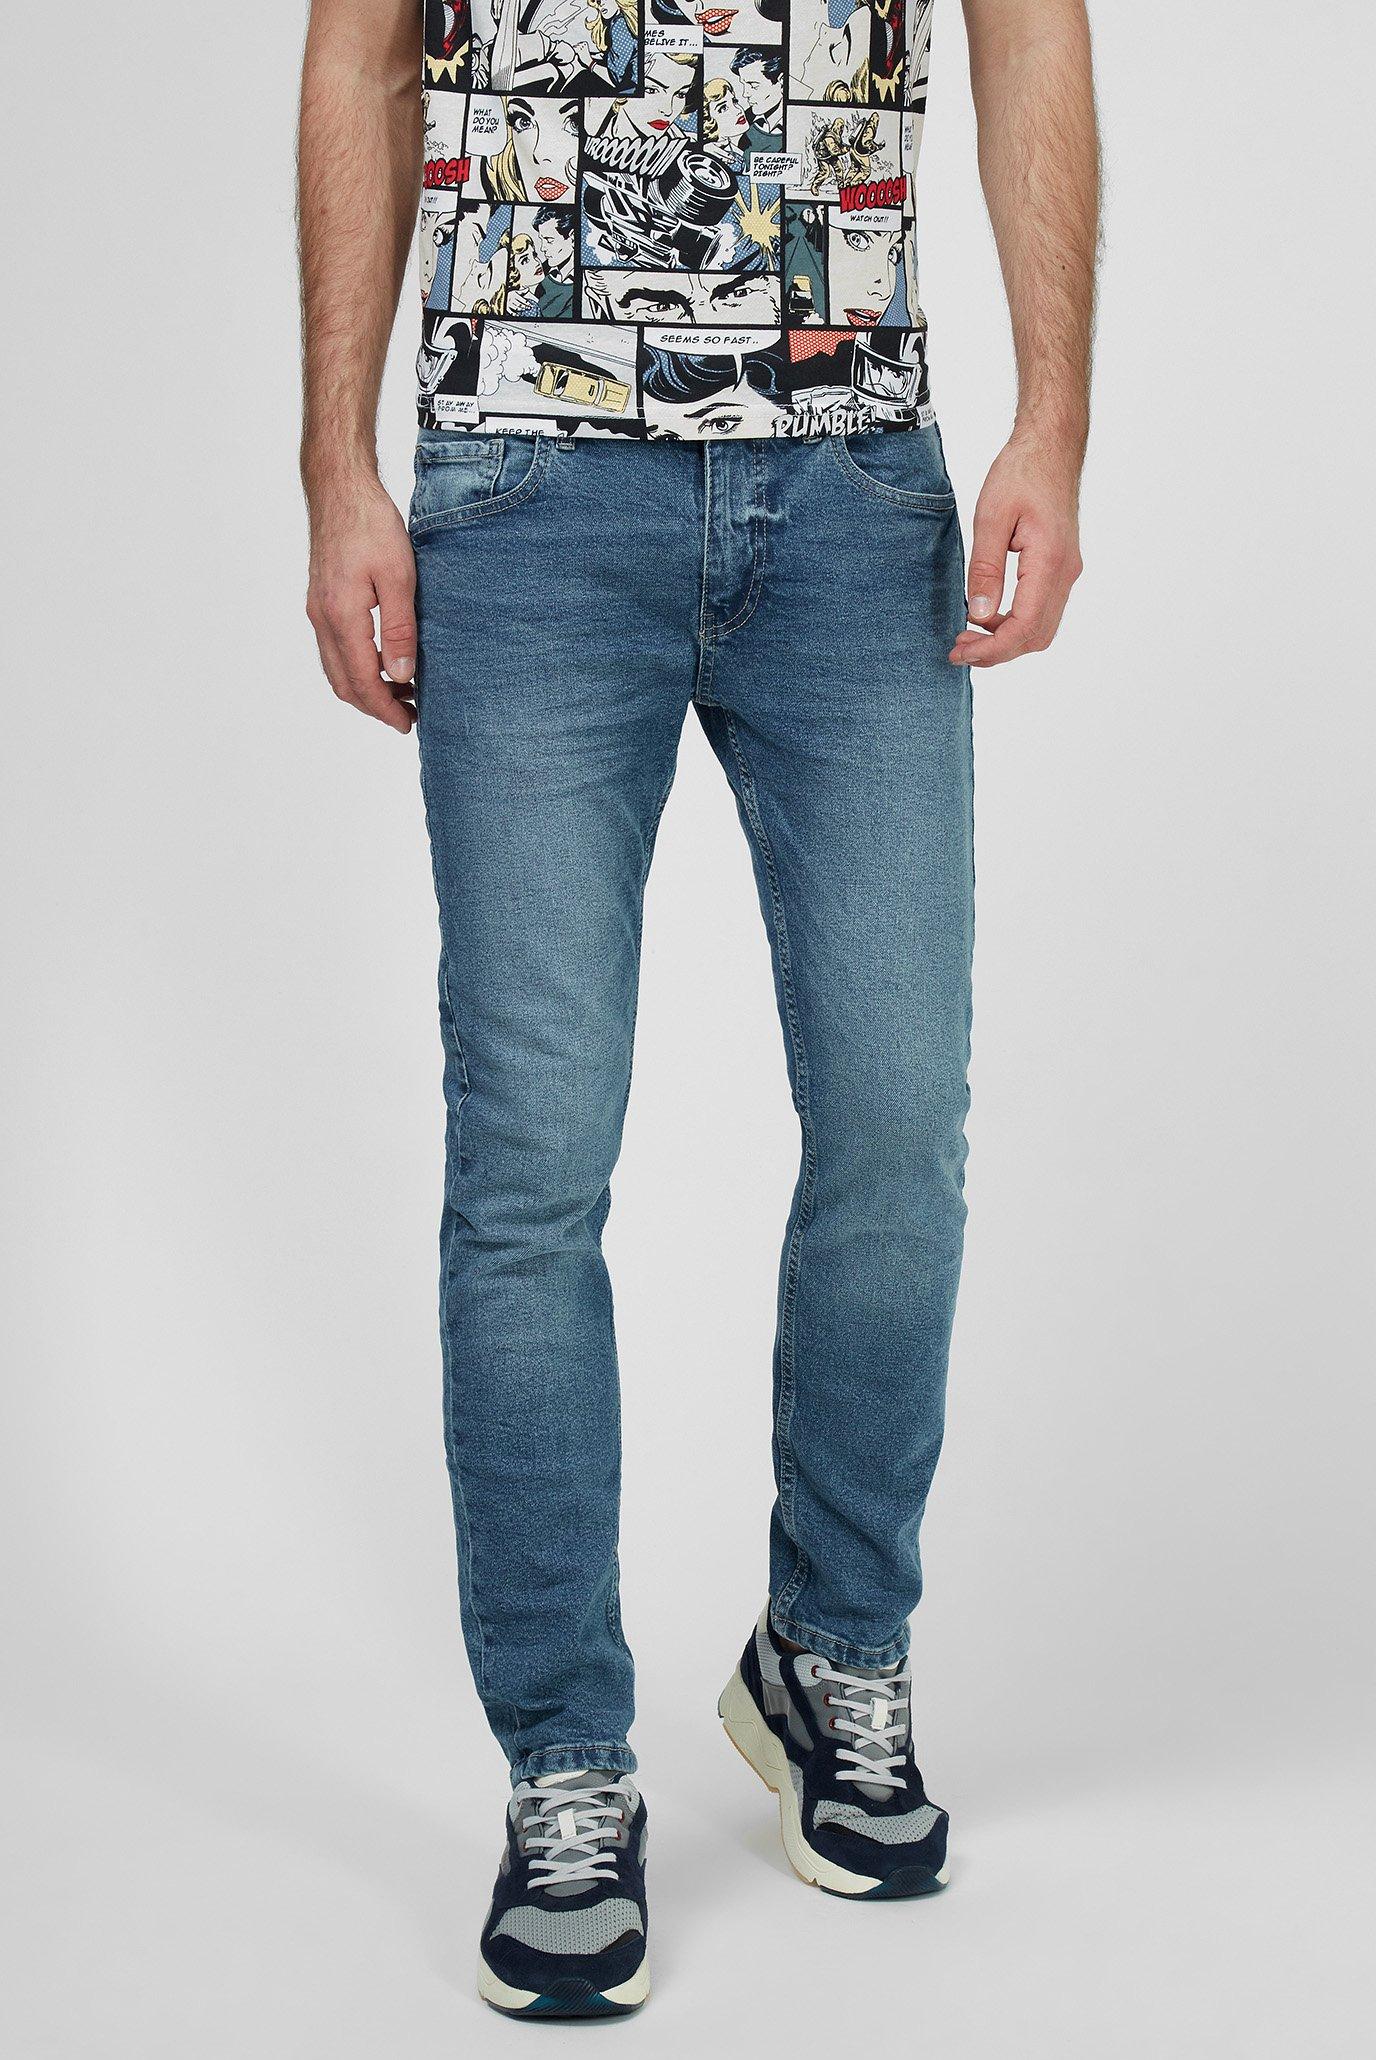 Мужские голубые джинсы Terranova 0046299 — MD-Fashion